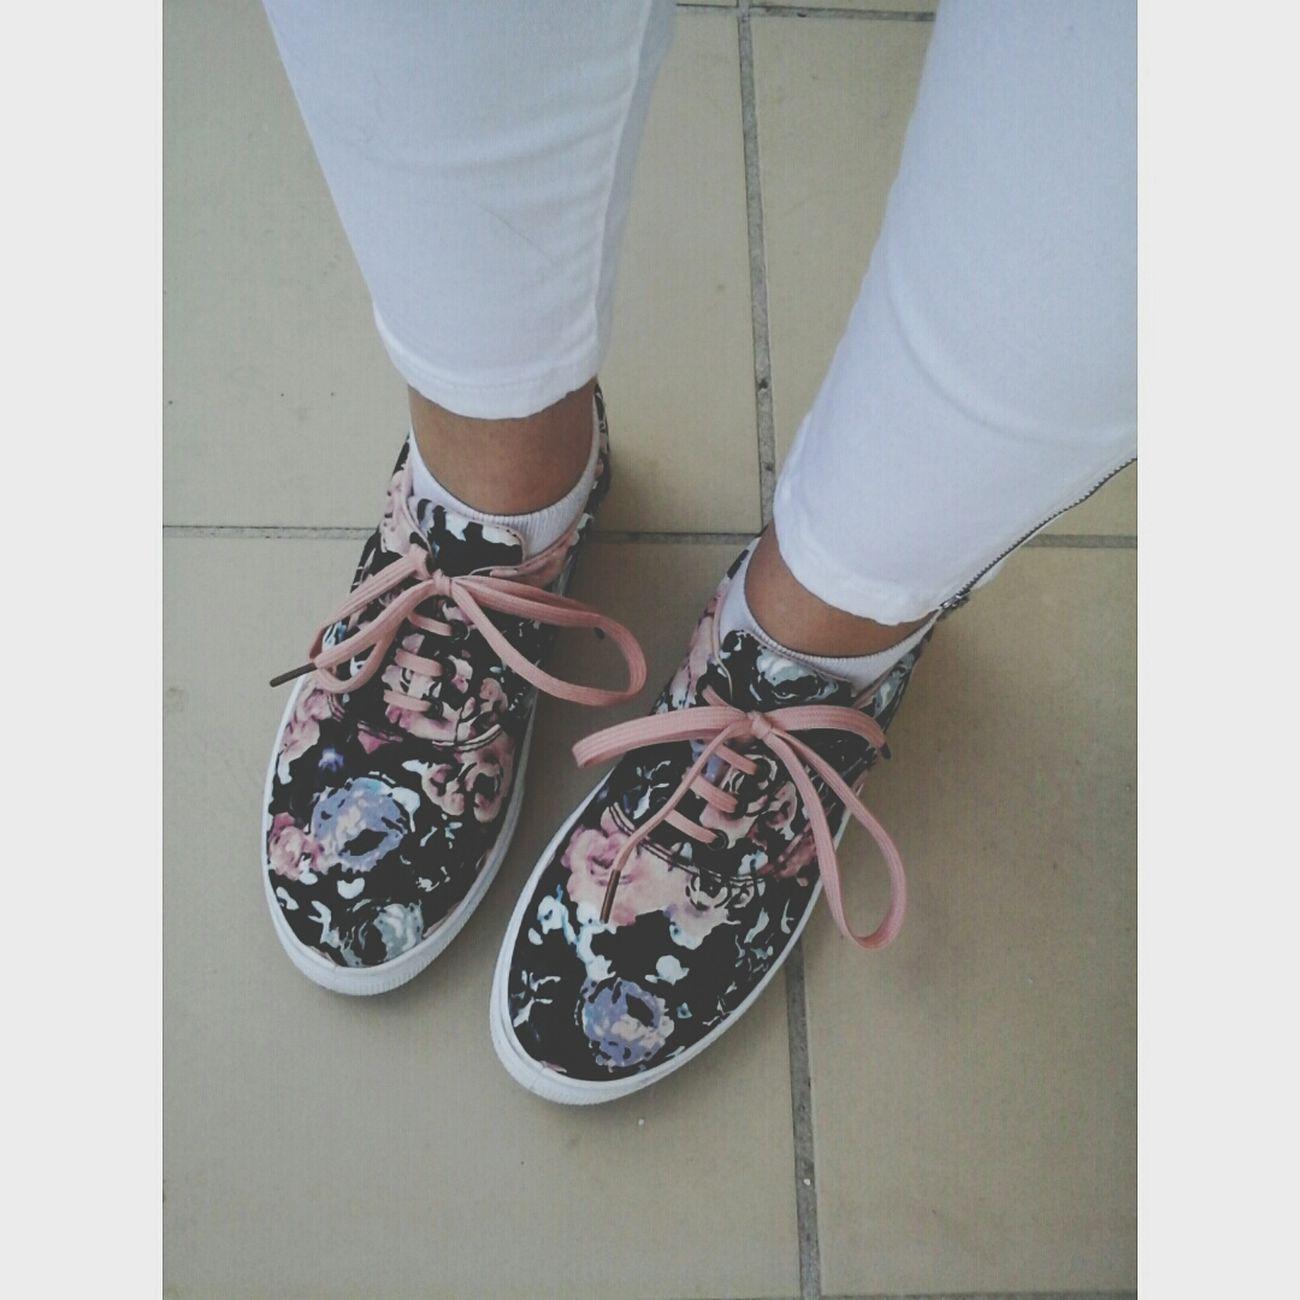 Newbabies Thanksdad Generous Shoes